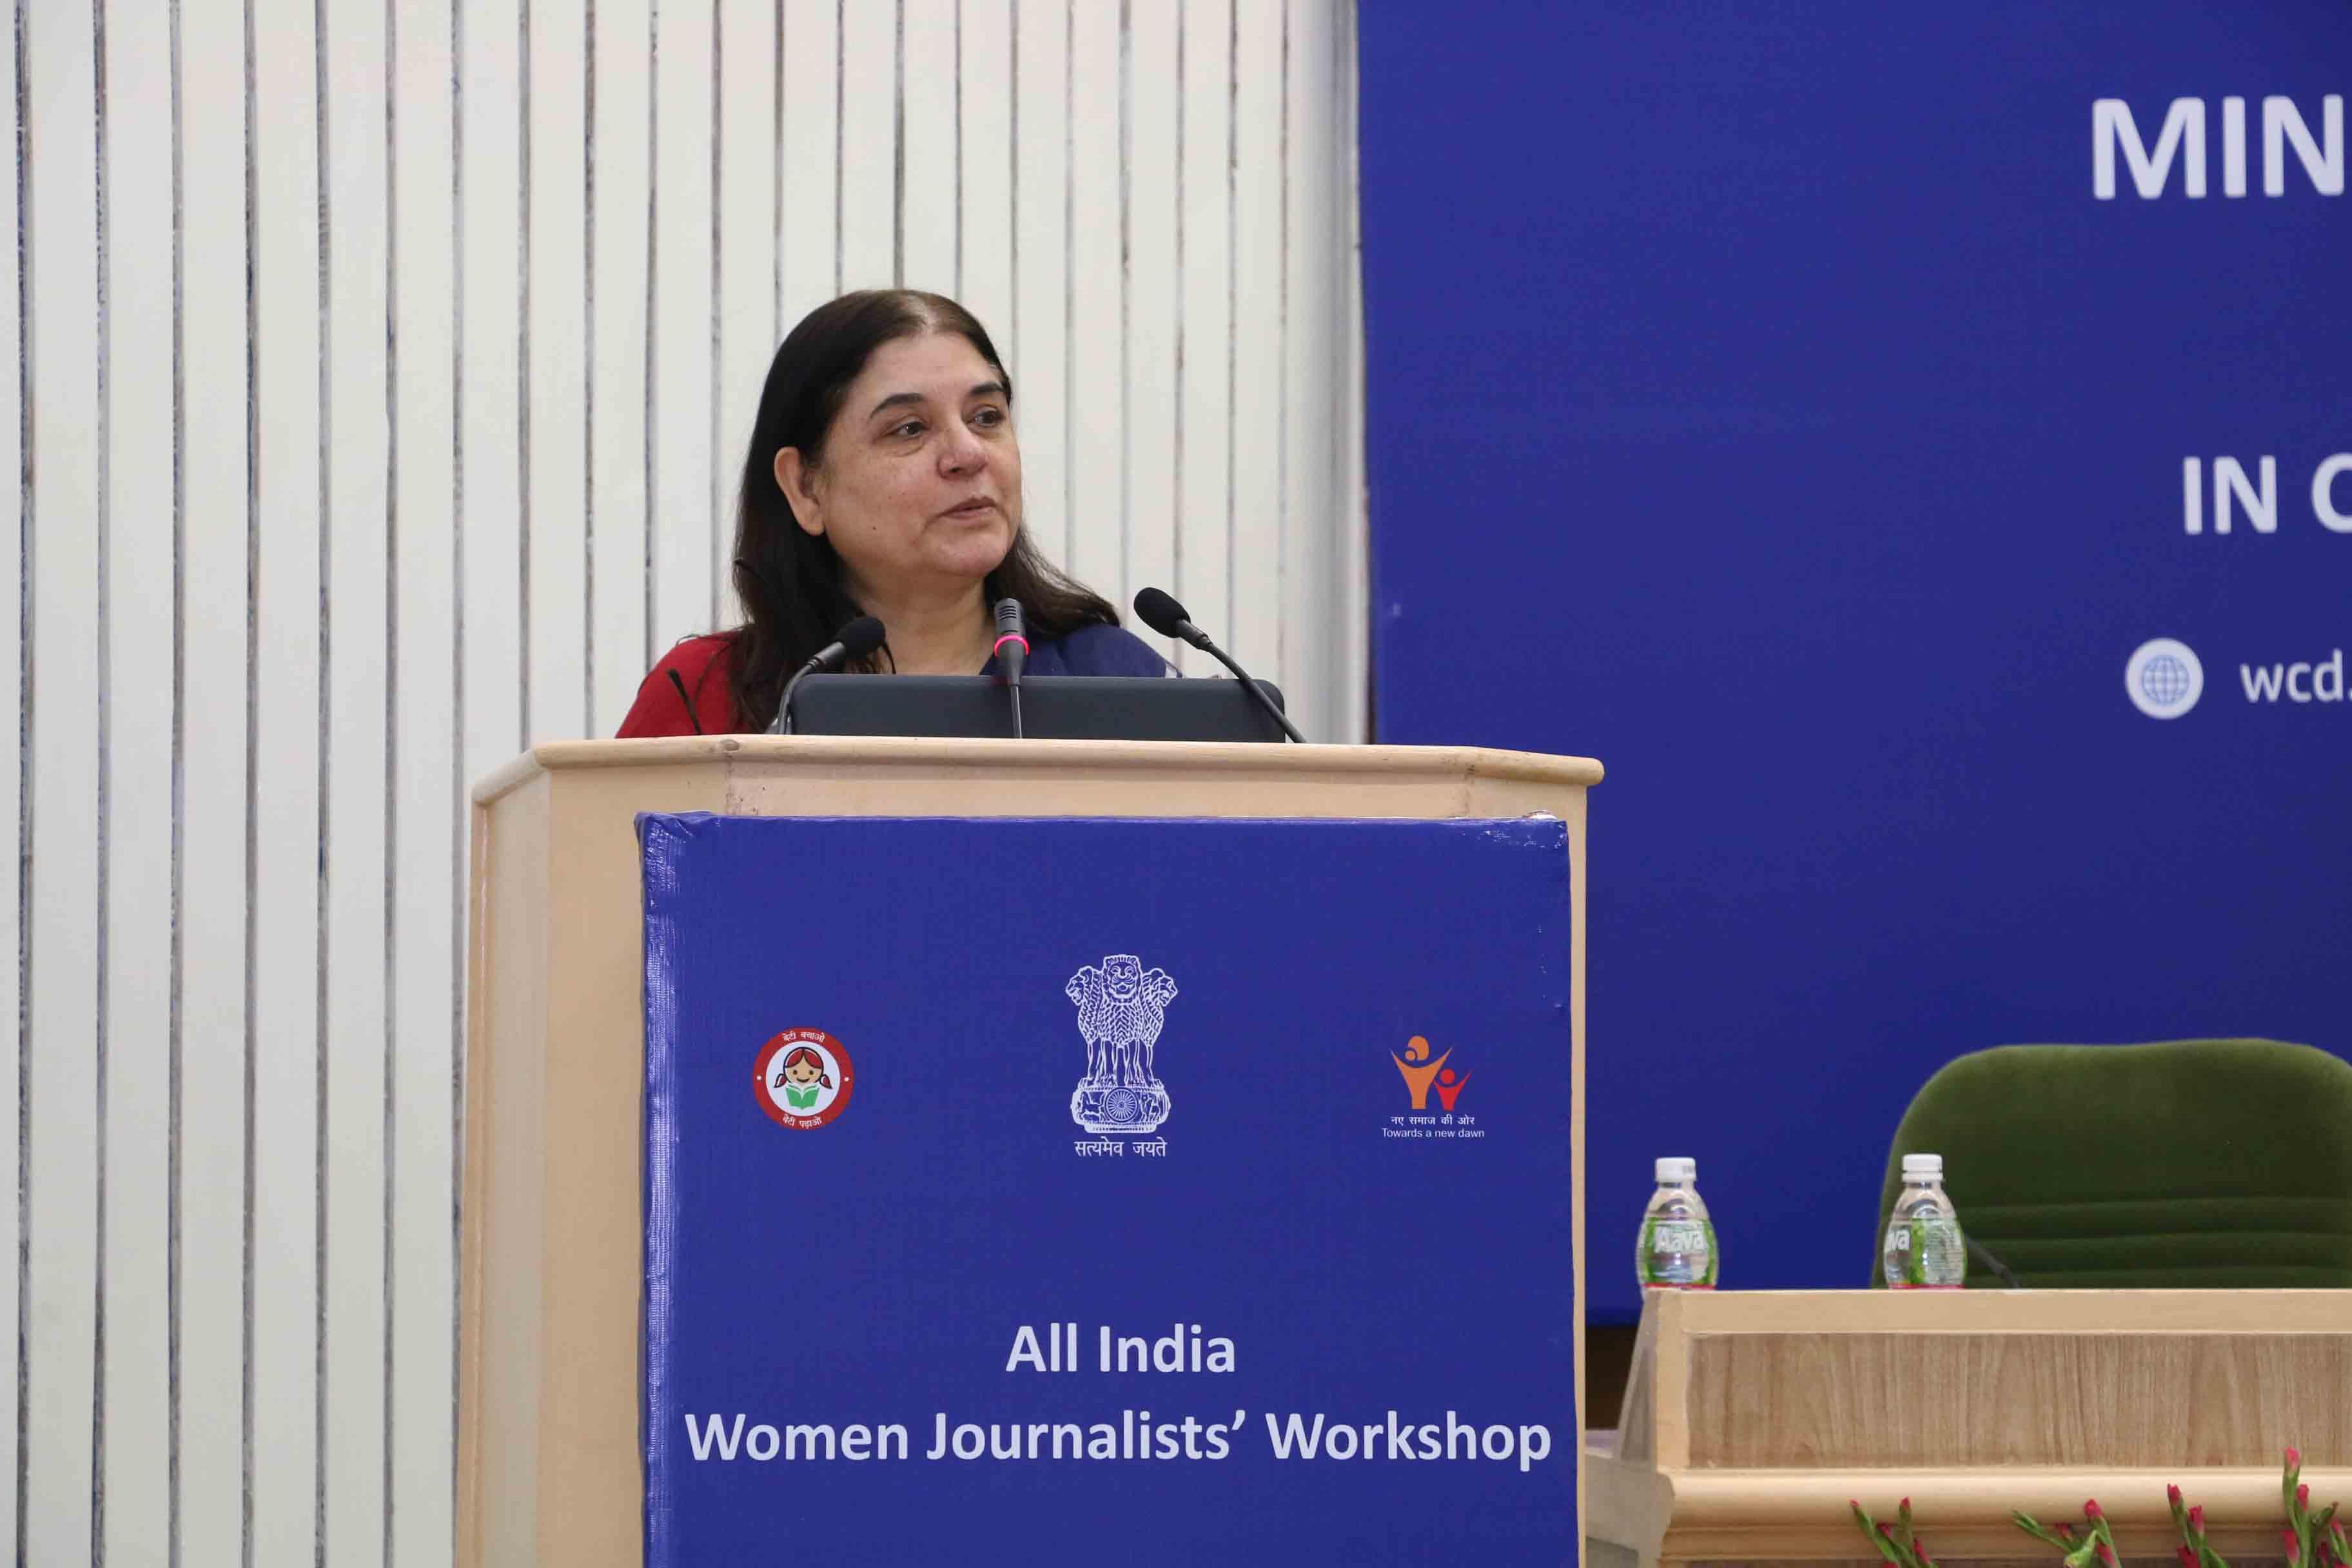 All India Women Journalists Workshop at Vigyan Bhawan 8